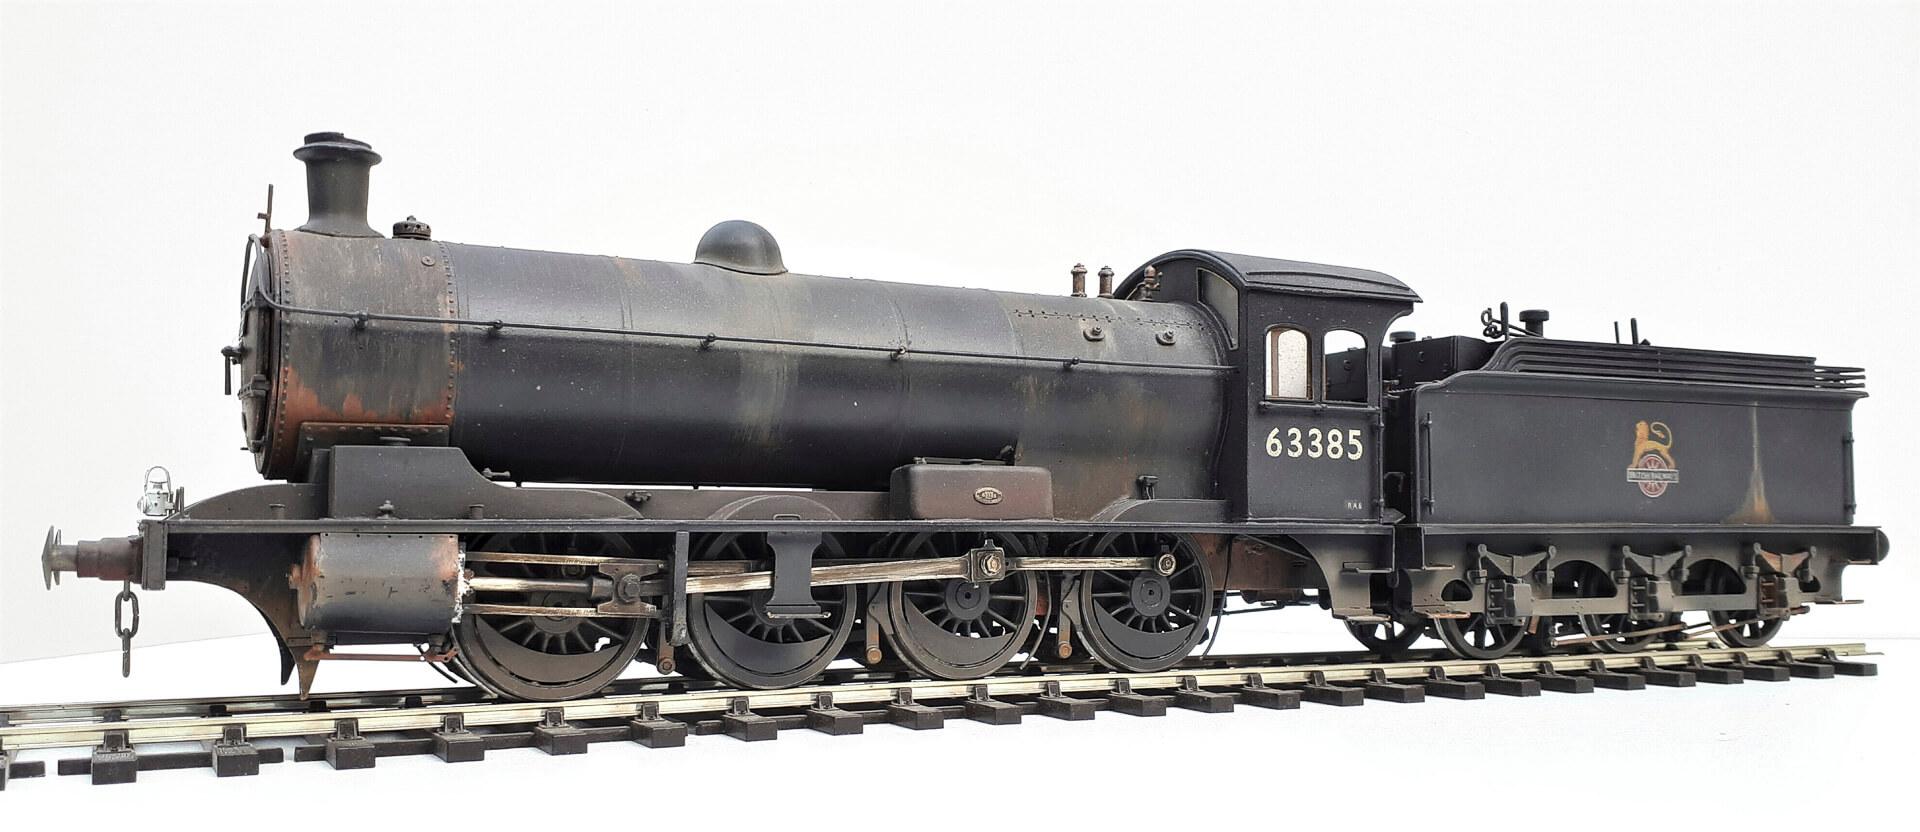 Q6 Class no. 63385